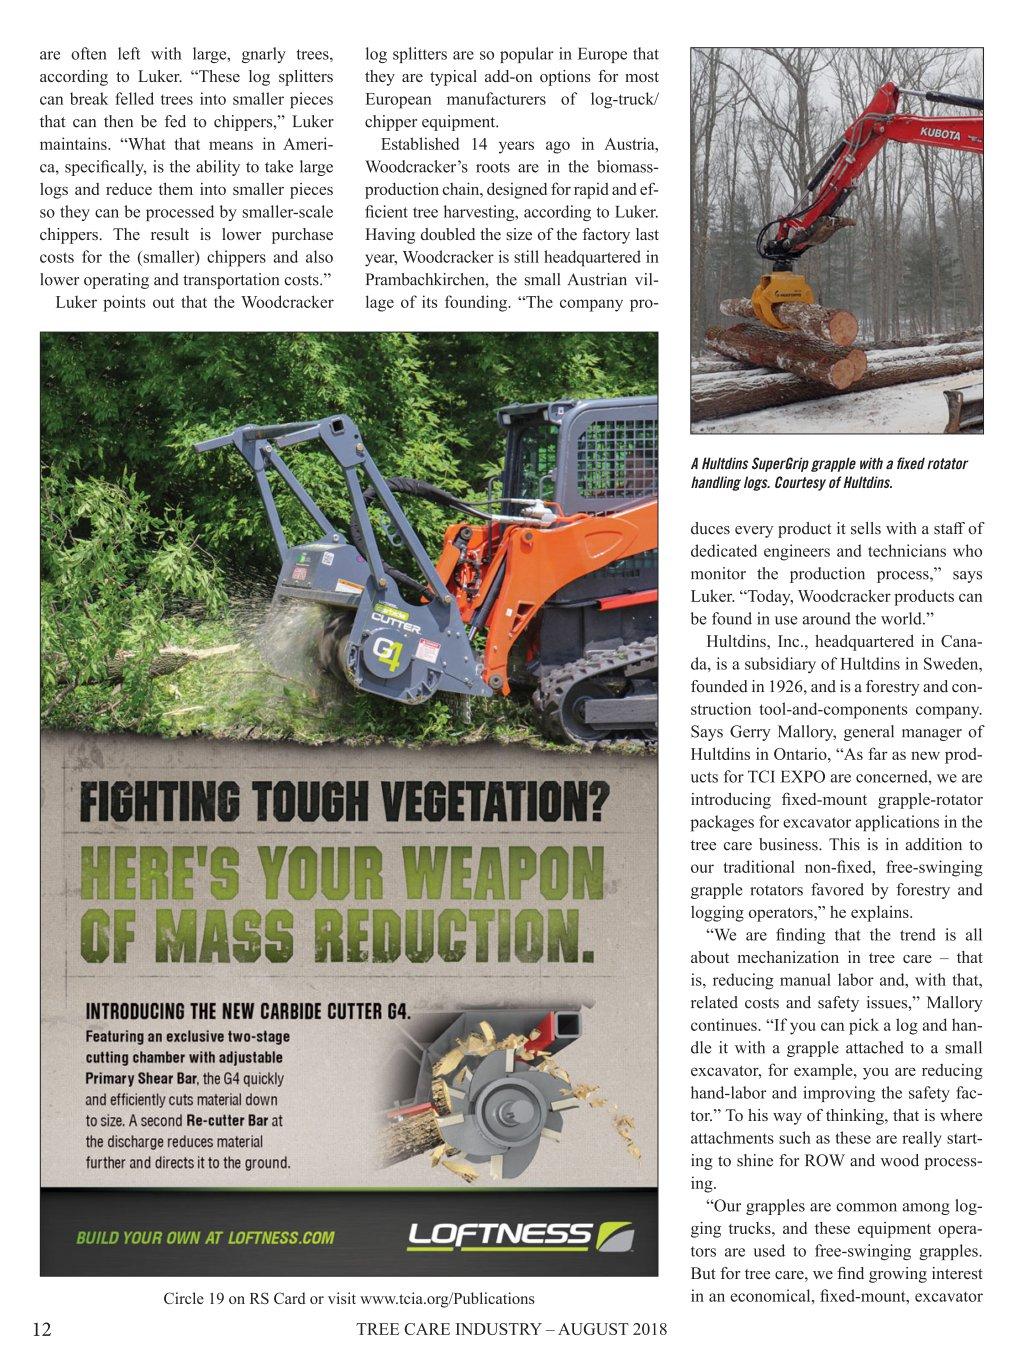 TCI Magazine August 2018 Digimag